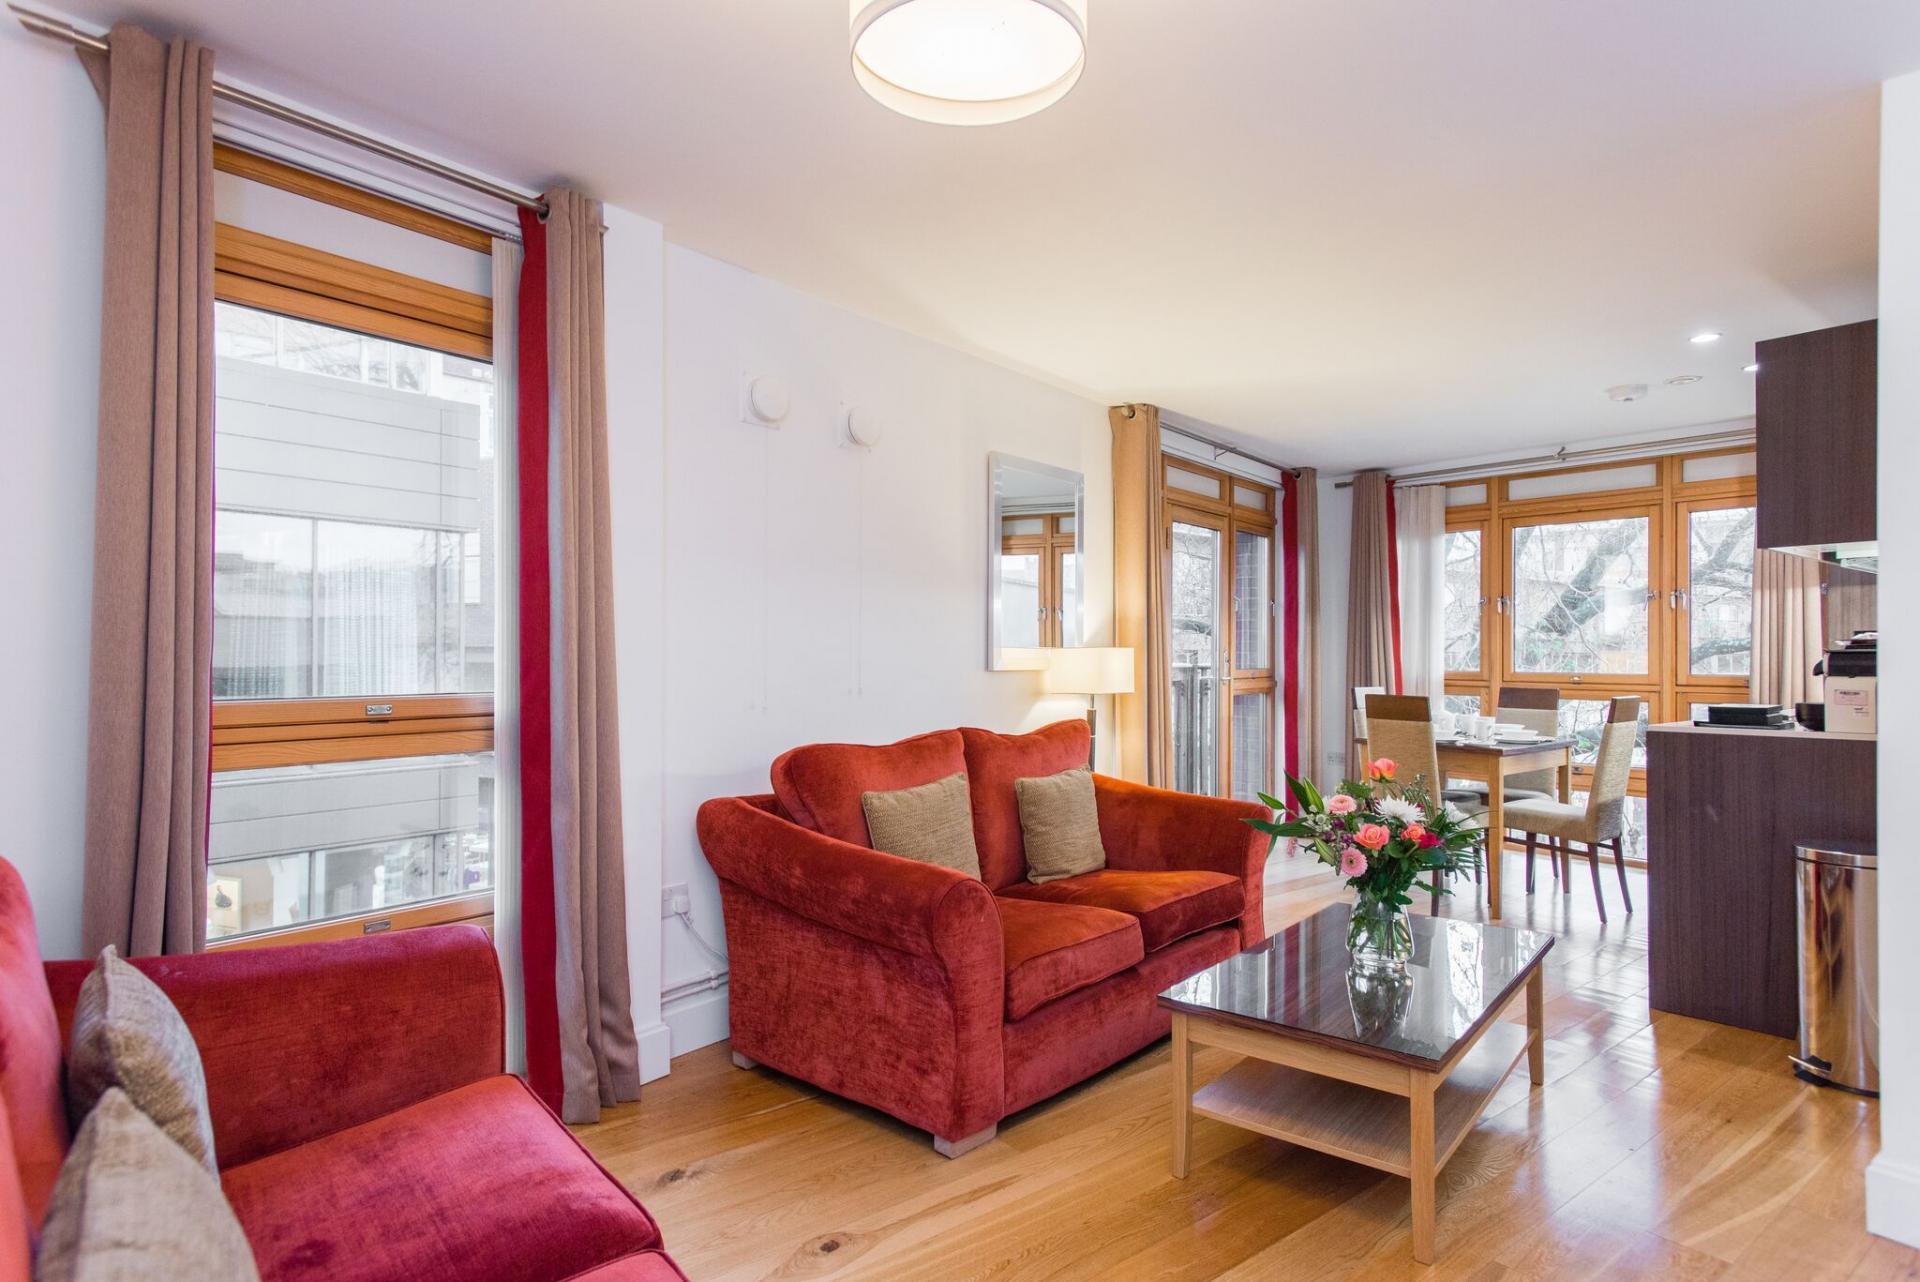 Lounge at Premier Suites Plus Cabot Circus